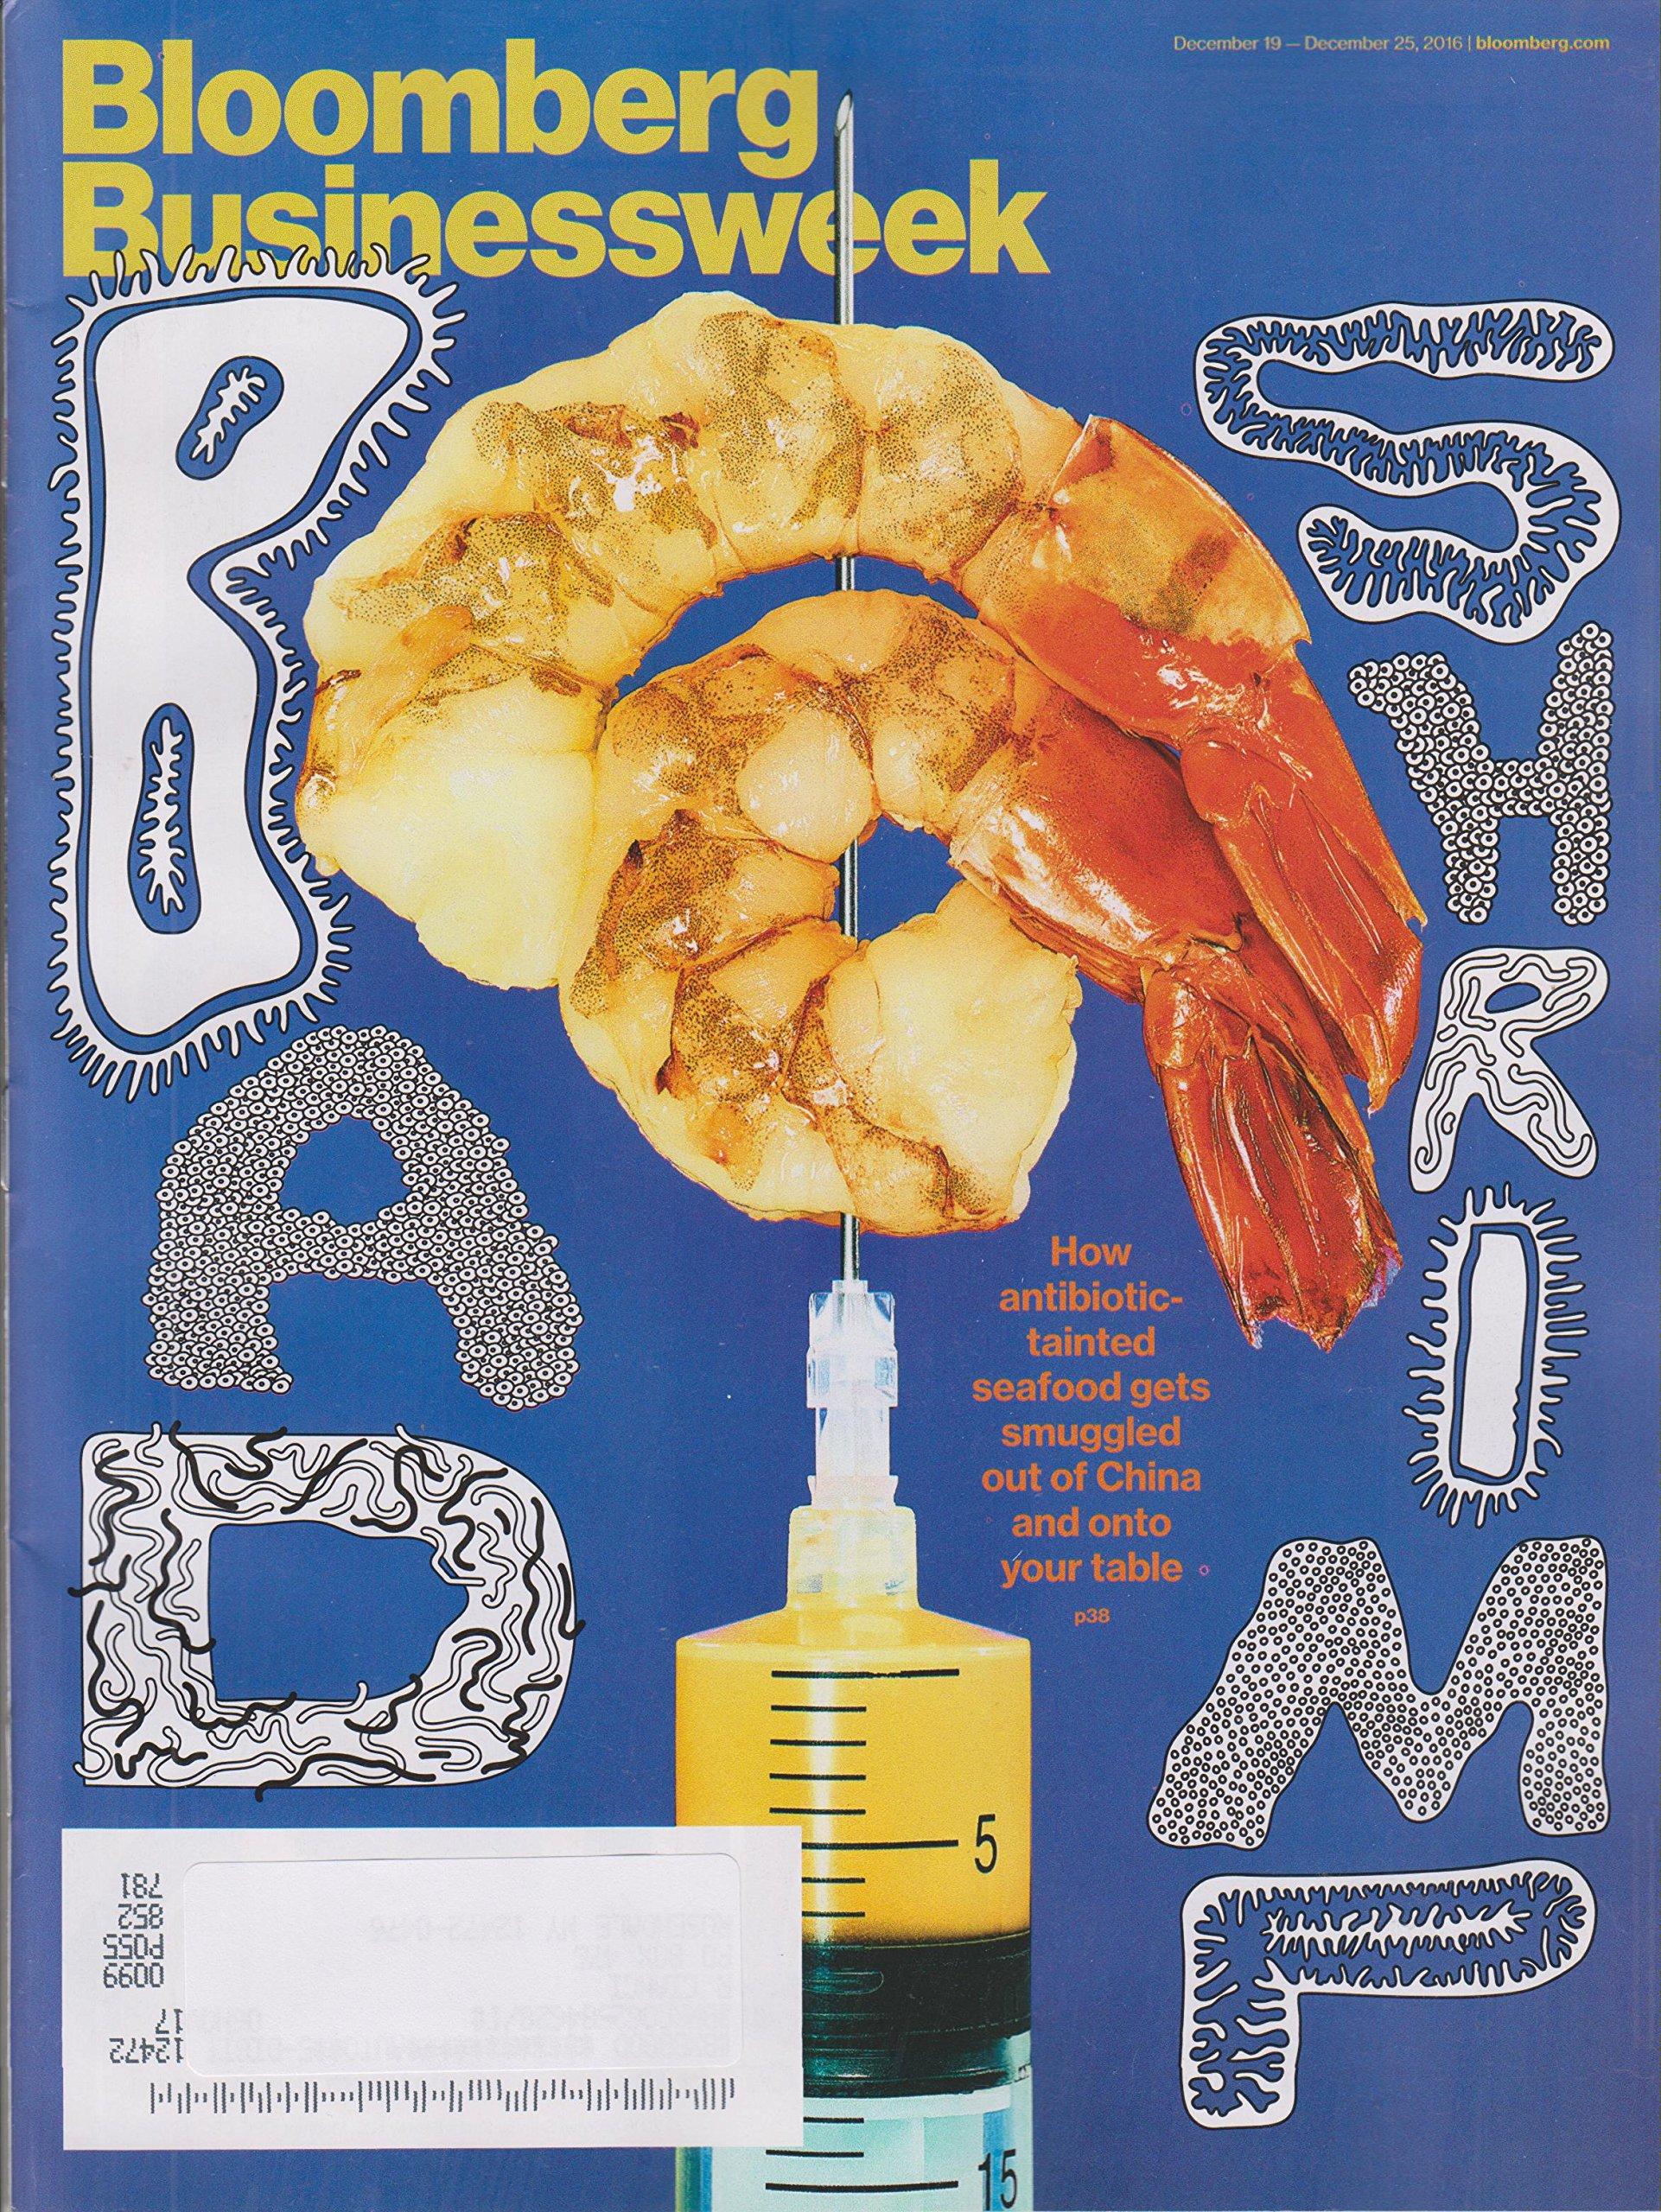 Bloomberg Businessweek December 19-25, 2016 Bad Shrimp pdf